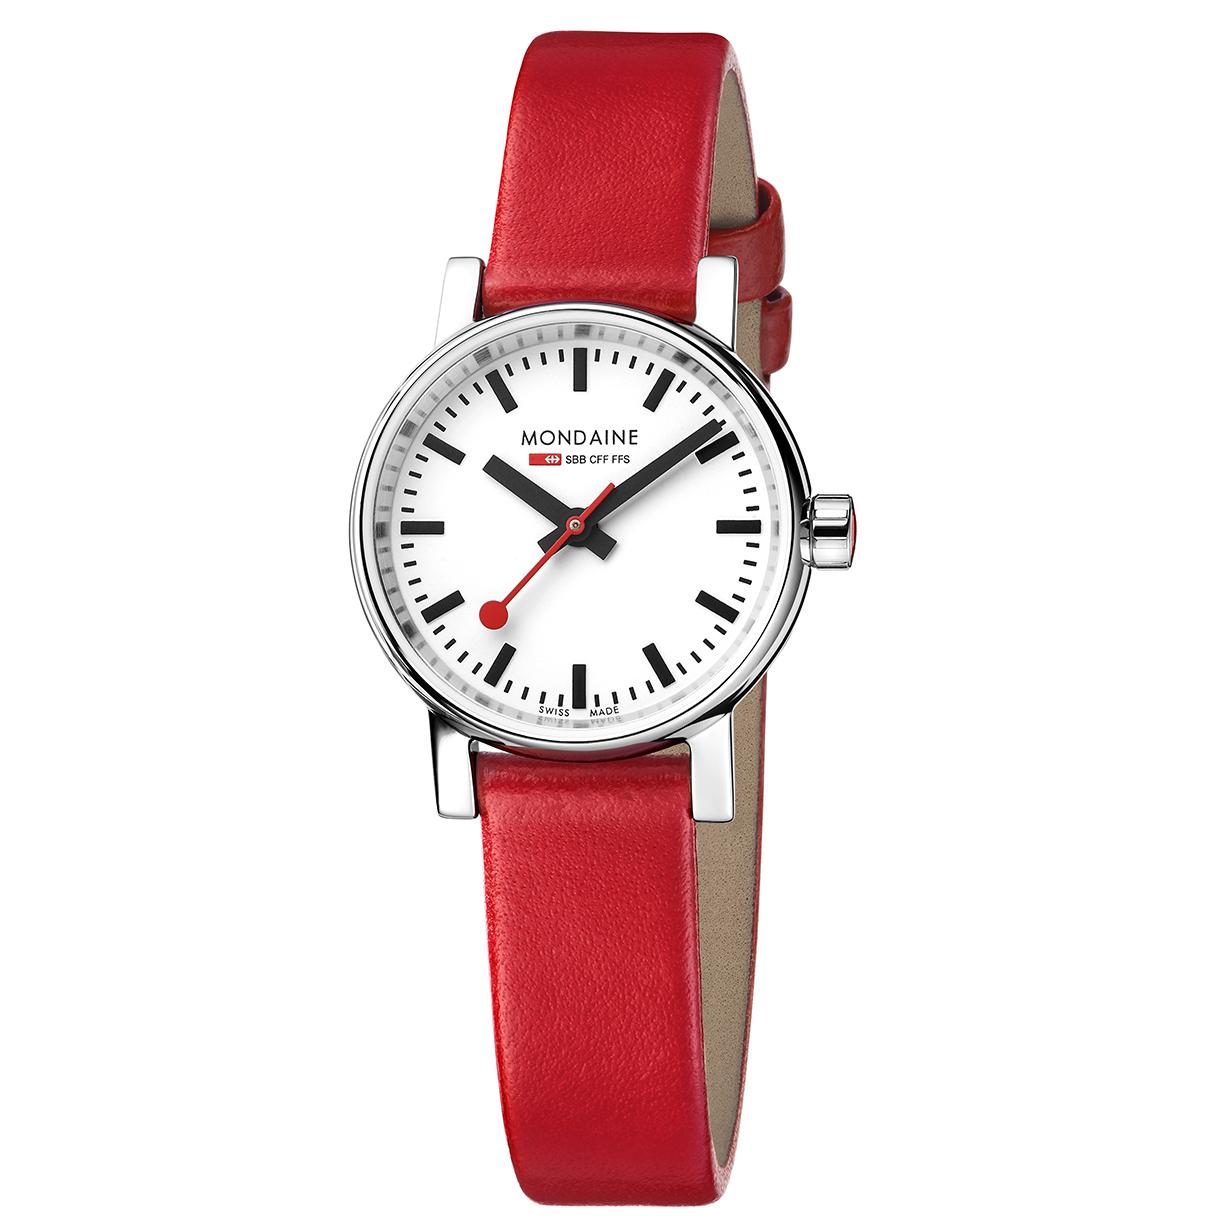 Mondaine Evo2 Petite Mondaine Watches Amp Clocks